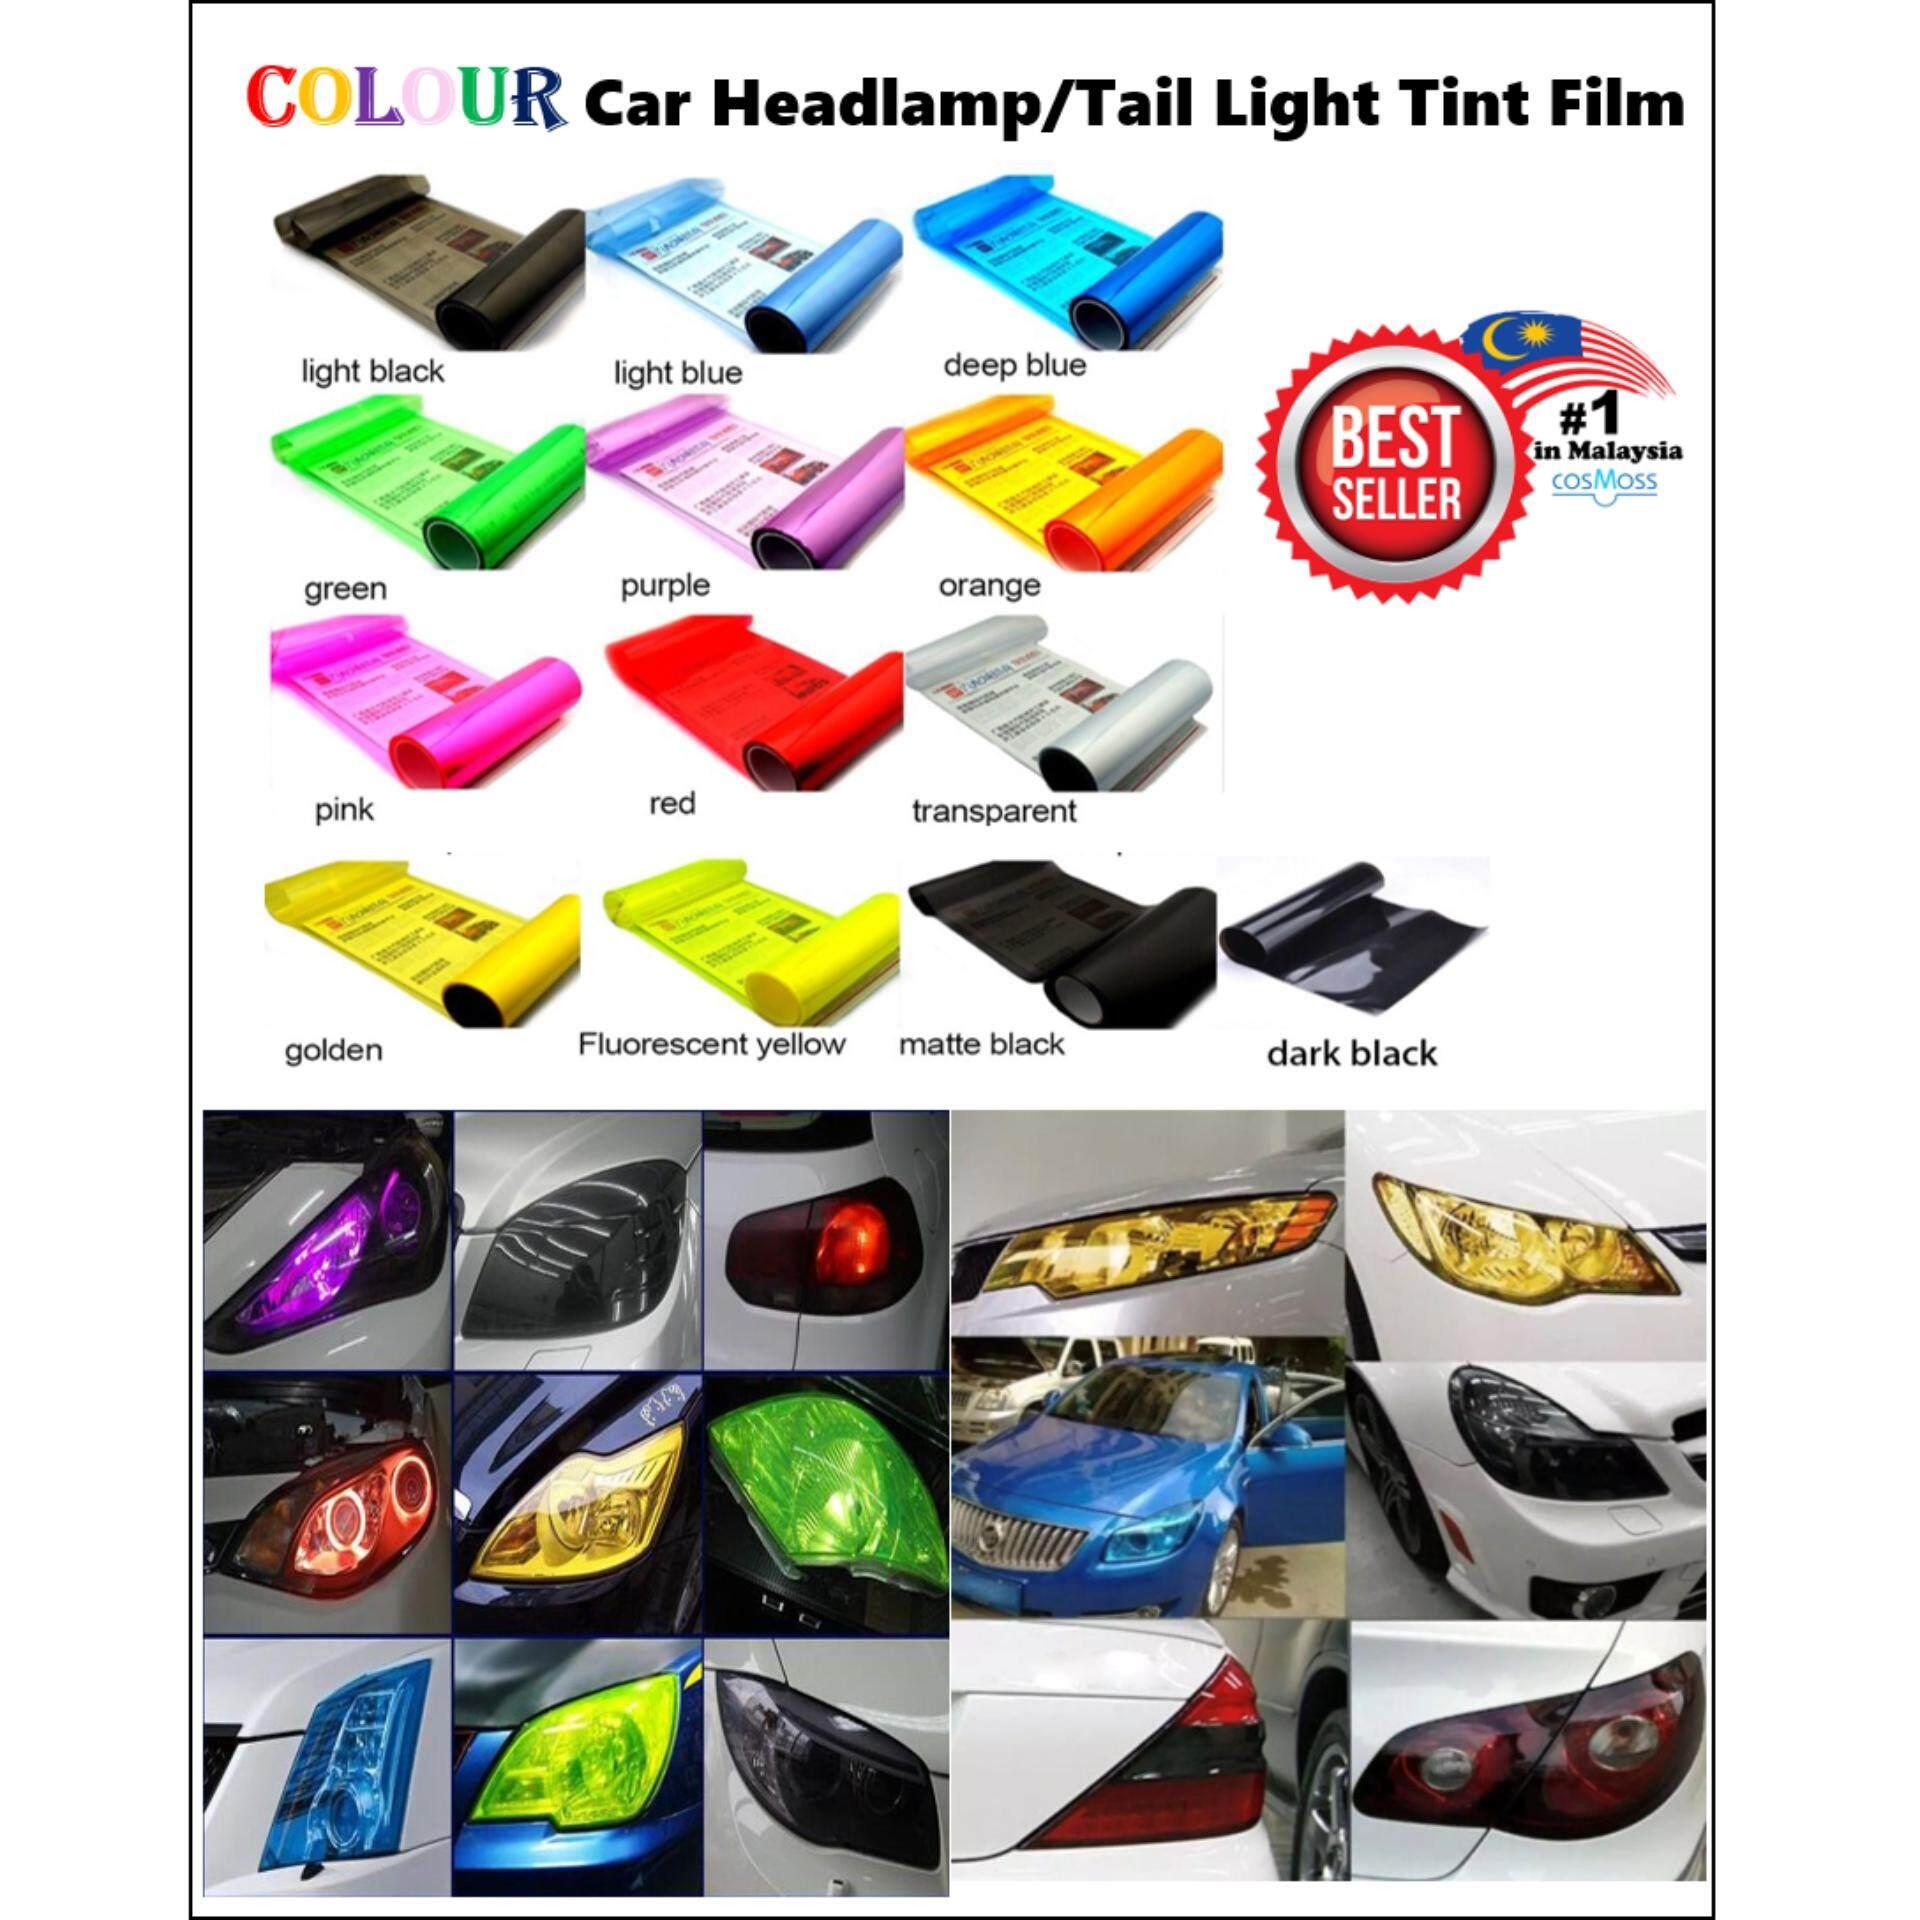 CAR HEADLAMP HEADLIGHT FOG LIGHT TAIL LIGHT STICKER SMOKE TINT FLIM 13 COLOUR -LIGHT BLACK 30cm x 100cm